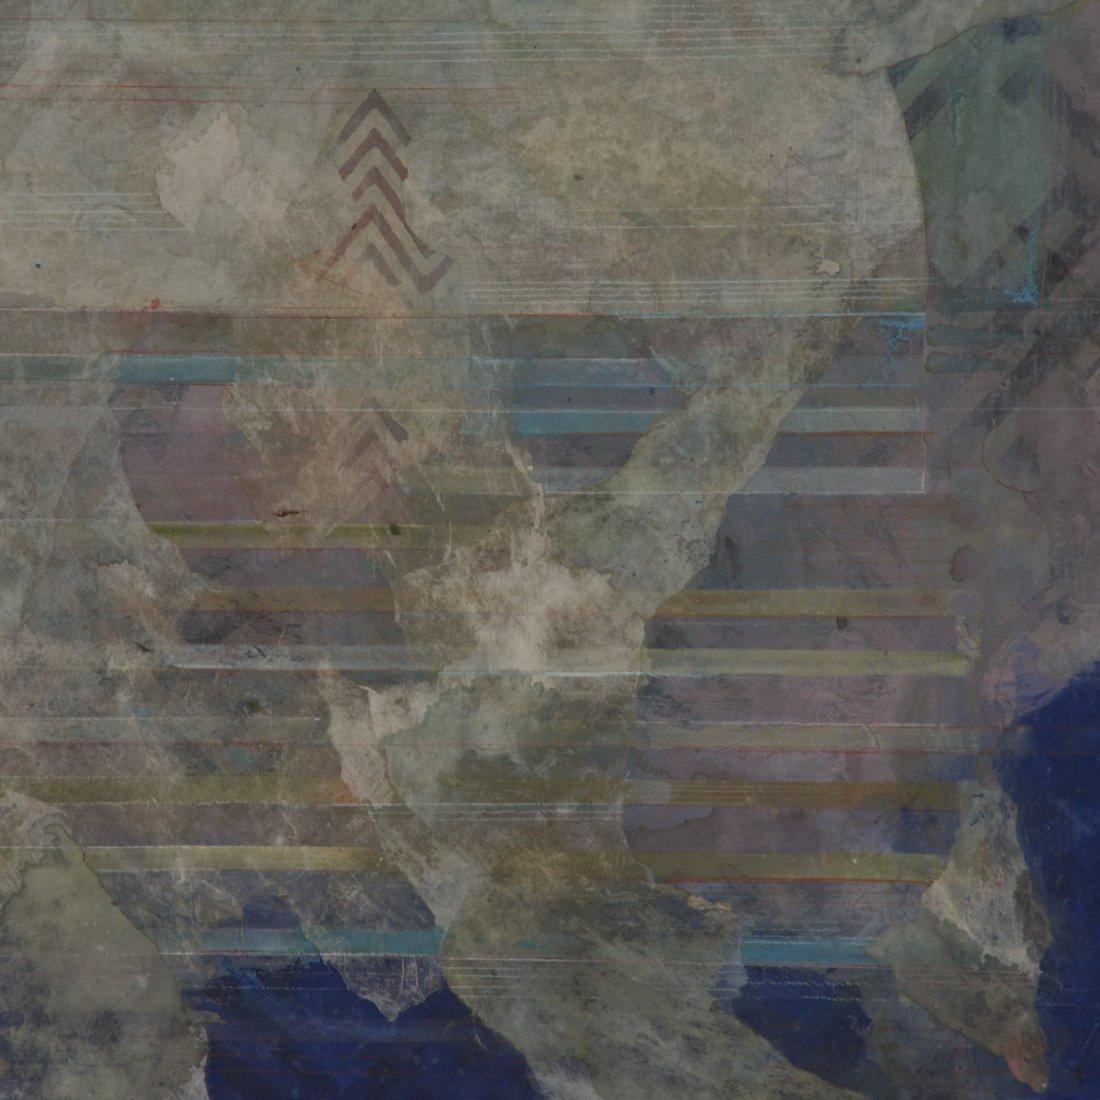 Robert Kelly, large collage monoprint - 4